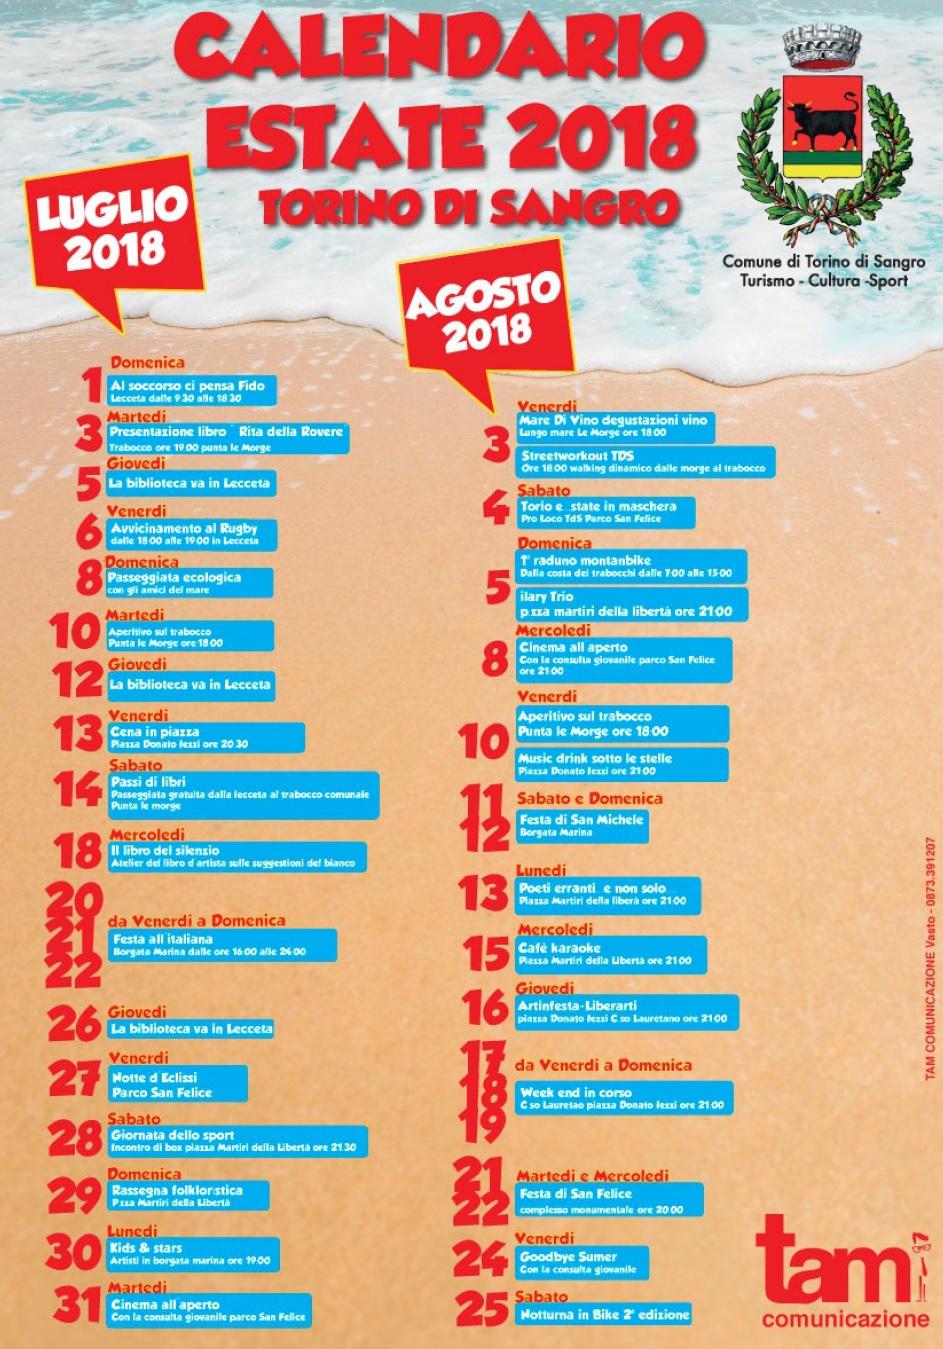 Calendario eventi estivi 2018 a Torino di Sangro